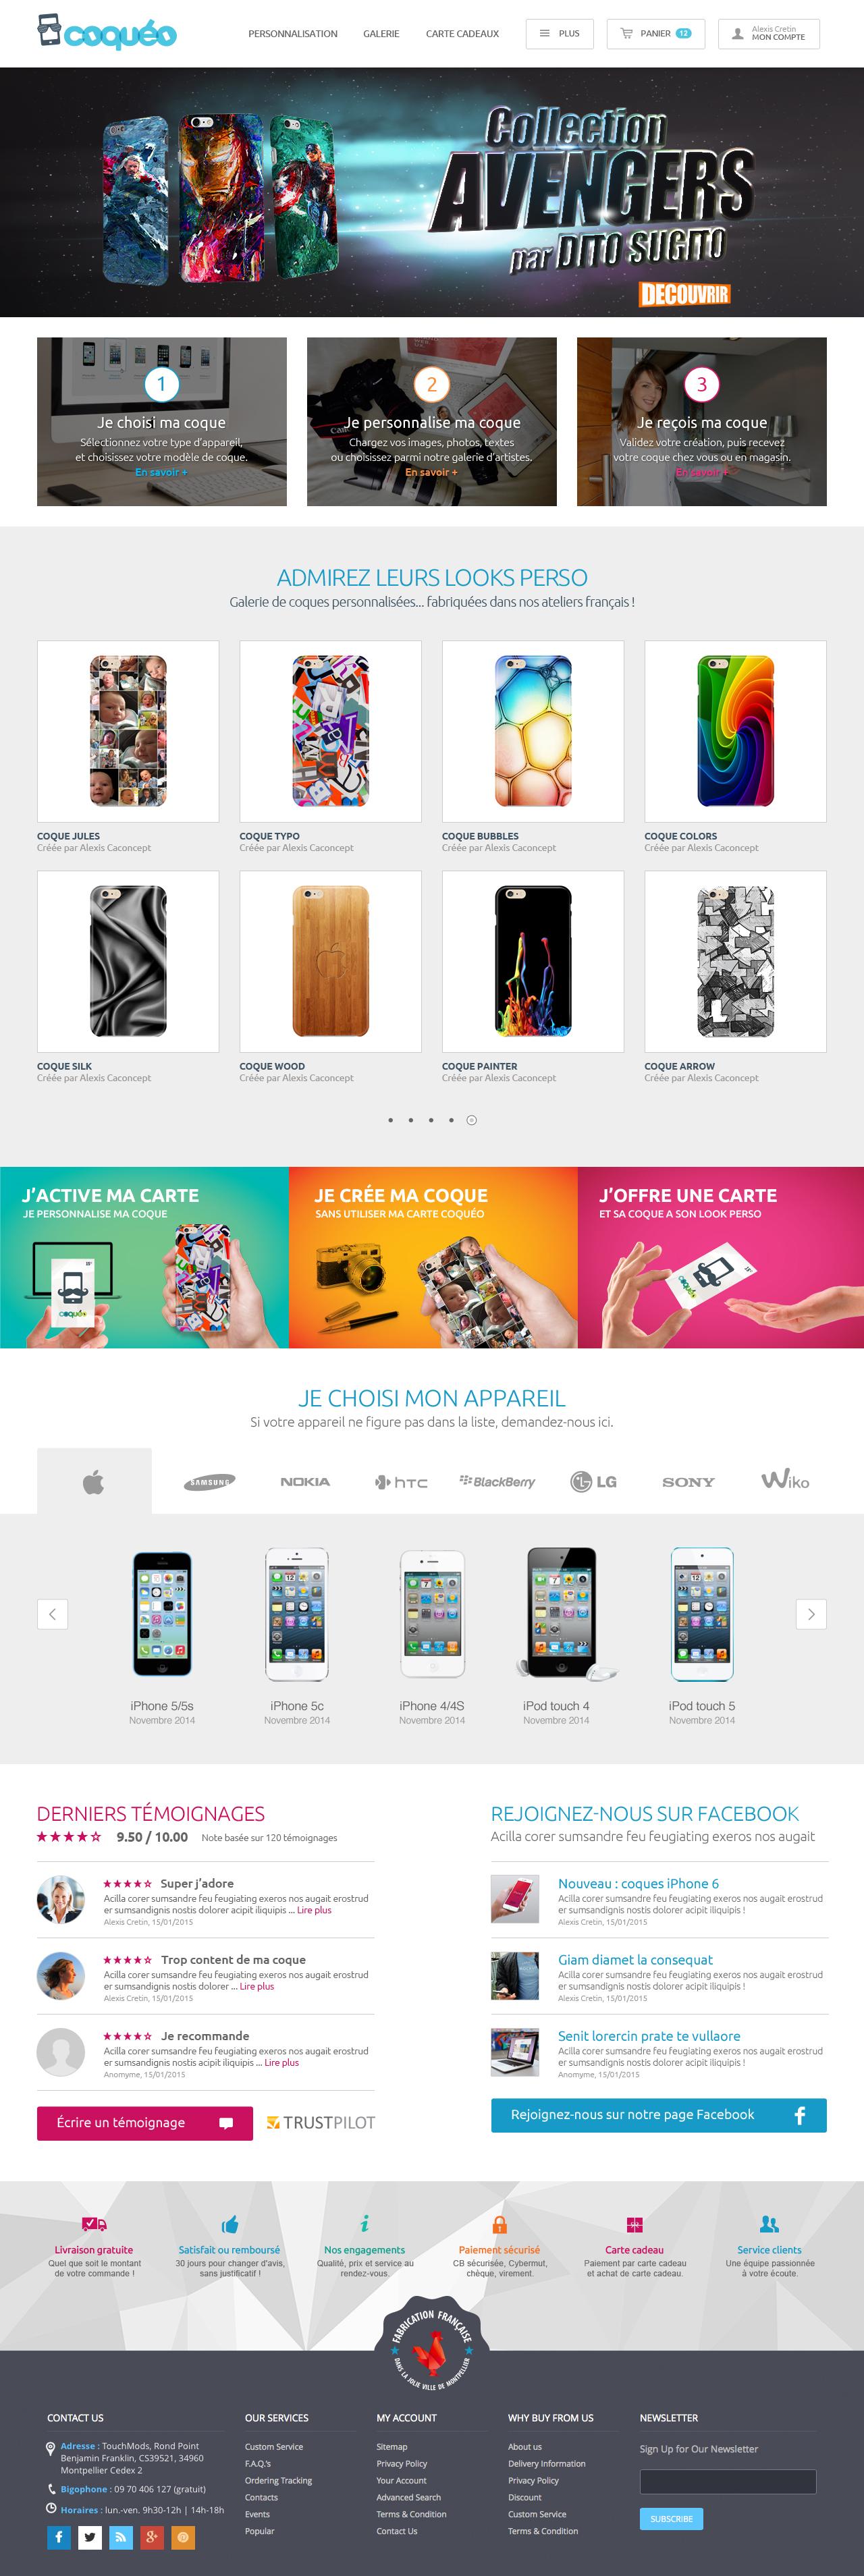 touchmods-design-site-coqueo-personnalisation-coque-mobile-tablette-creation-communication-caconcept-alexis-cretin-graphiste